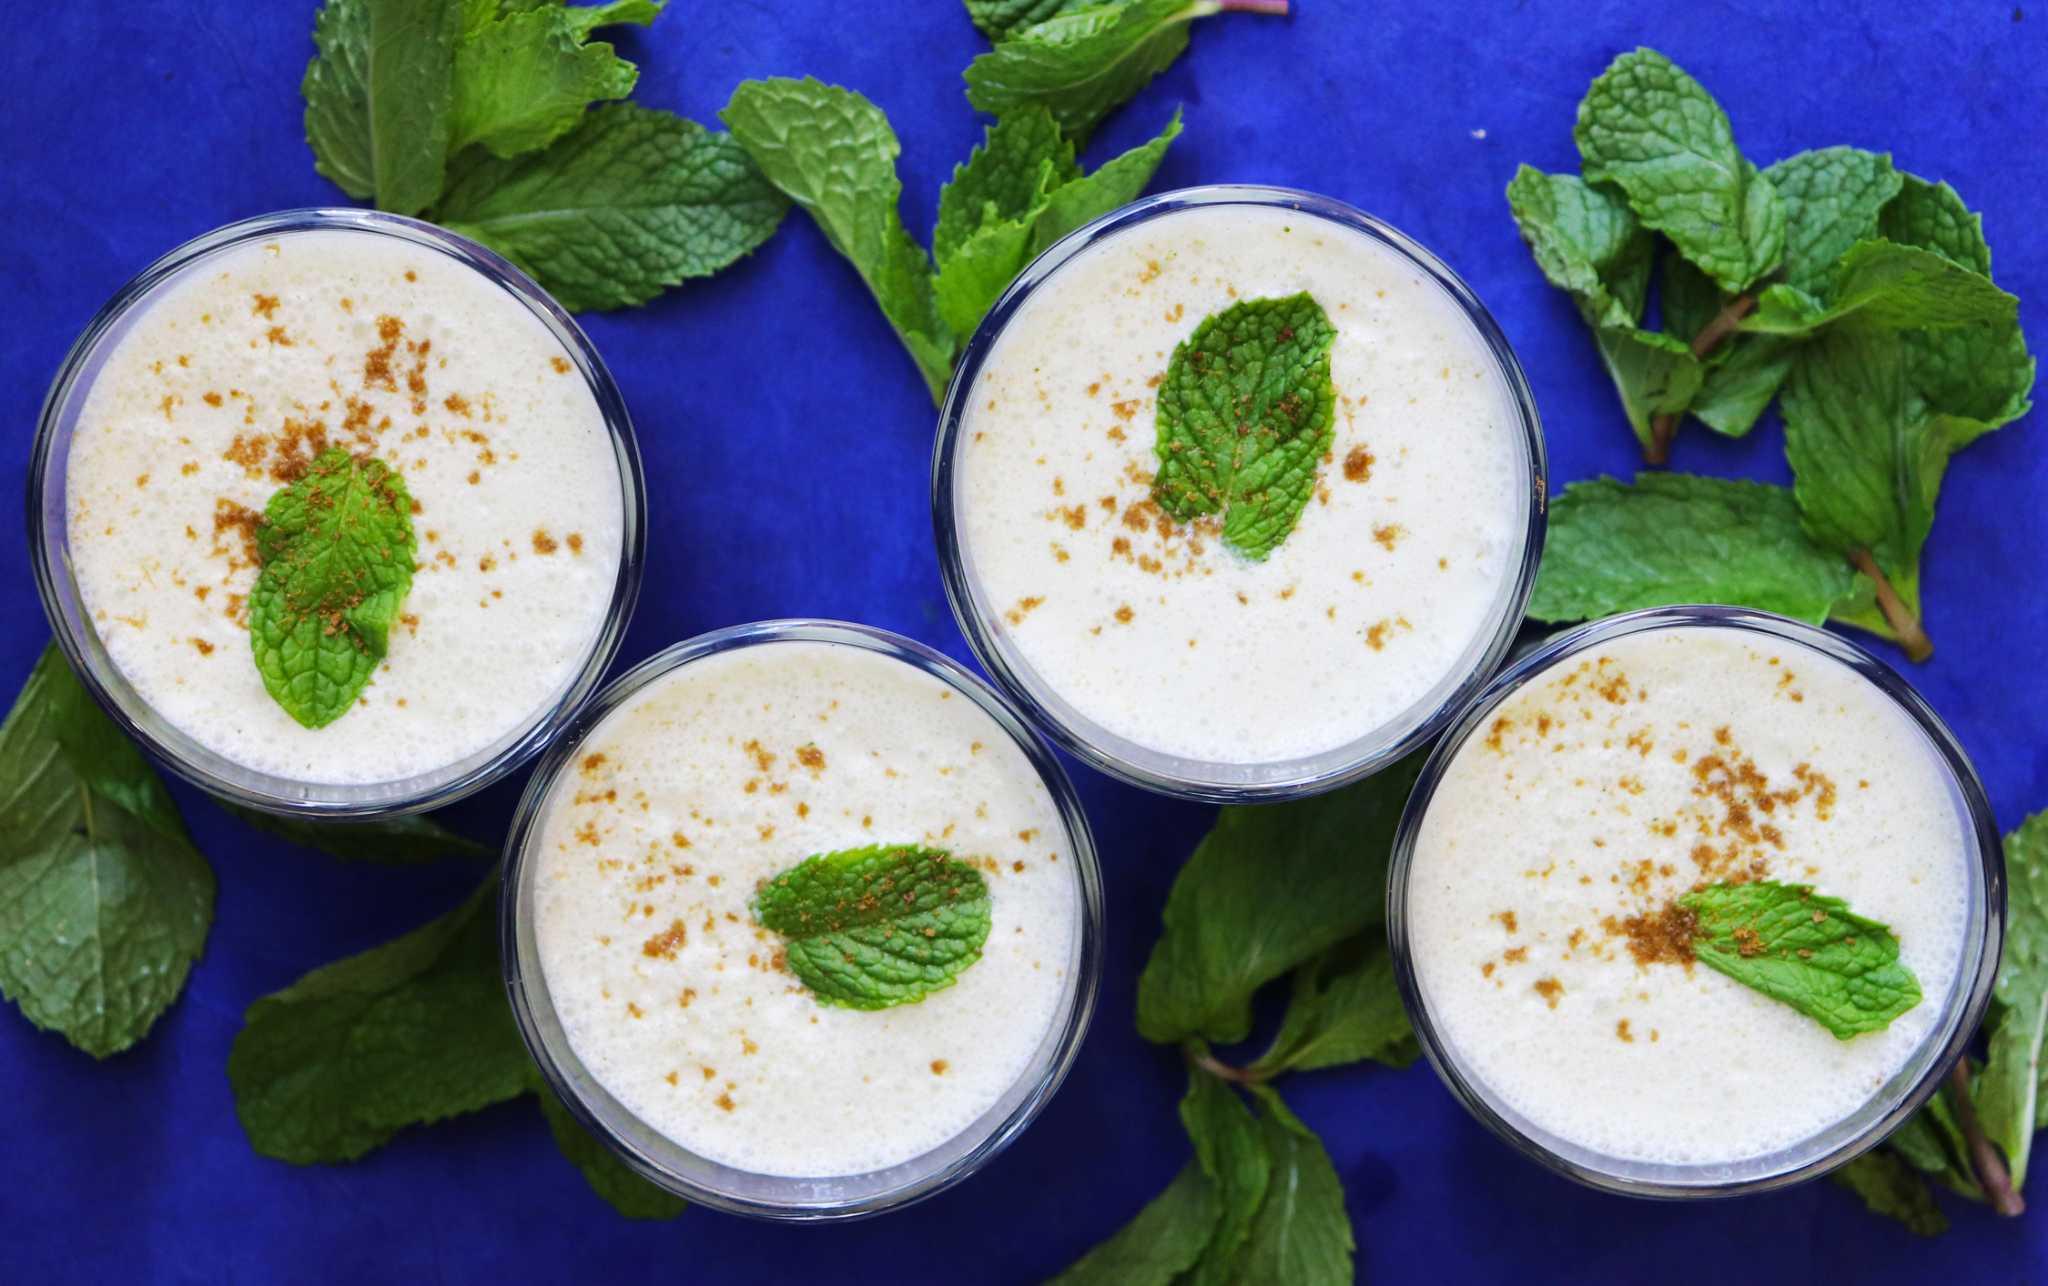 Cool off with Anita Jaisinghani's Ayurveda-minded mint lassi